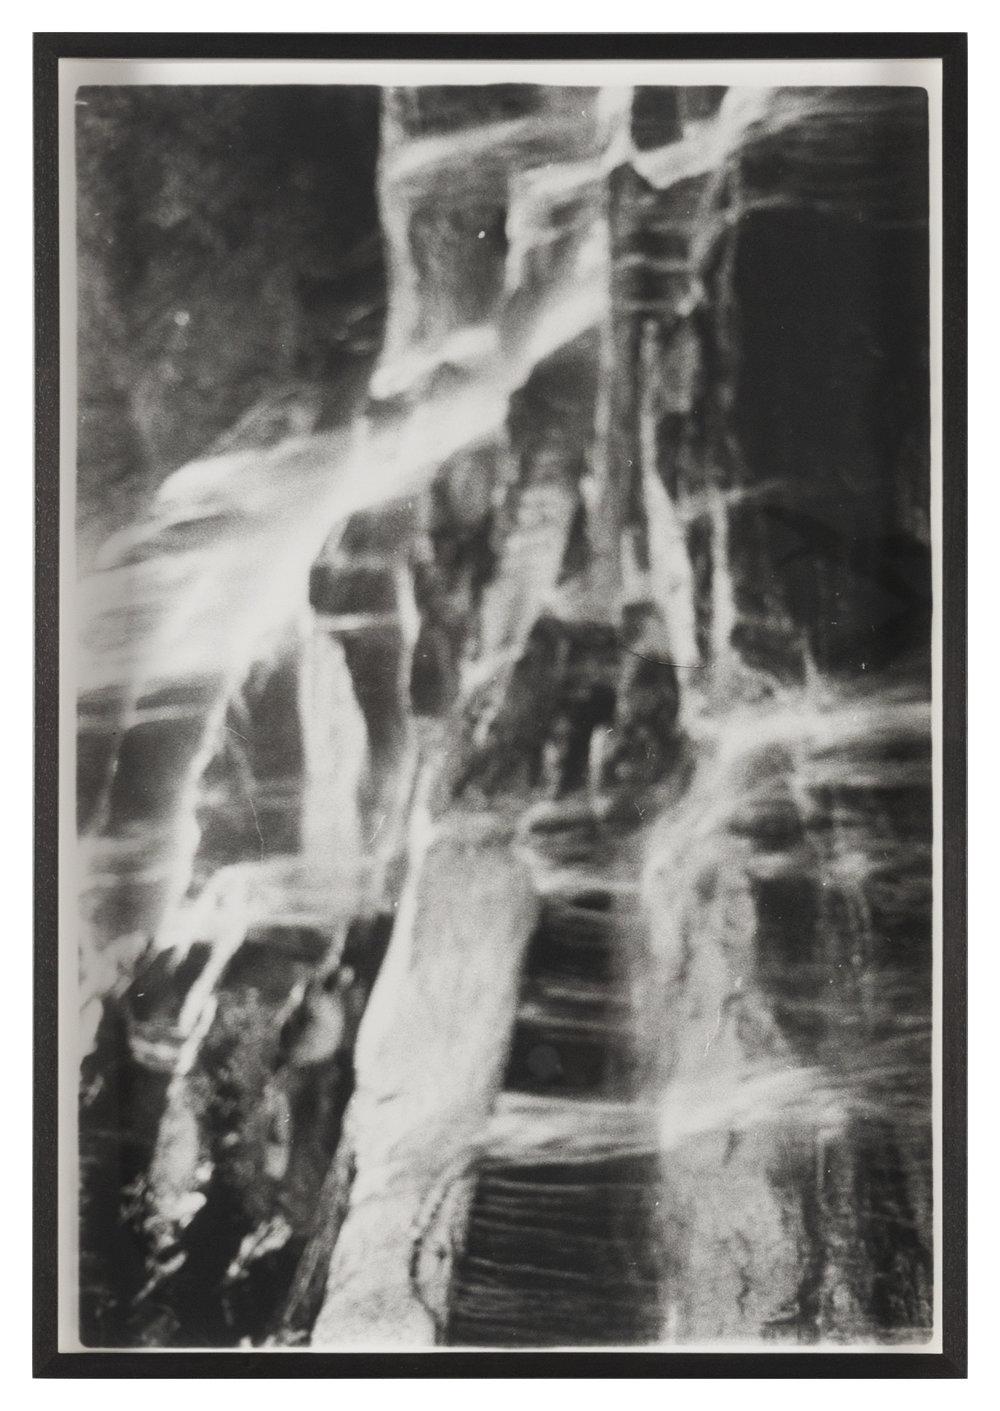 Anthony Hodgkinson \ Engulfed II \ 2018 \ Silver gelatin print \ 66 x 46.5cm \ Edition of 3 + 1 AP